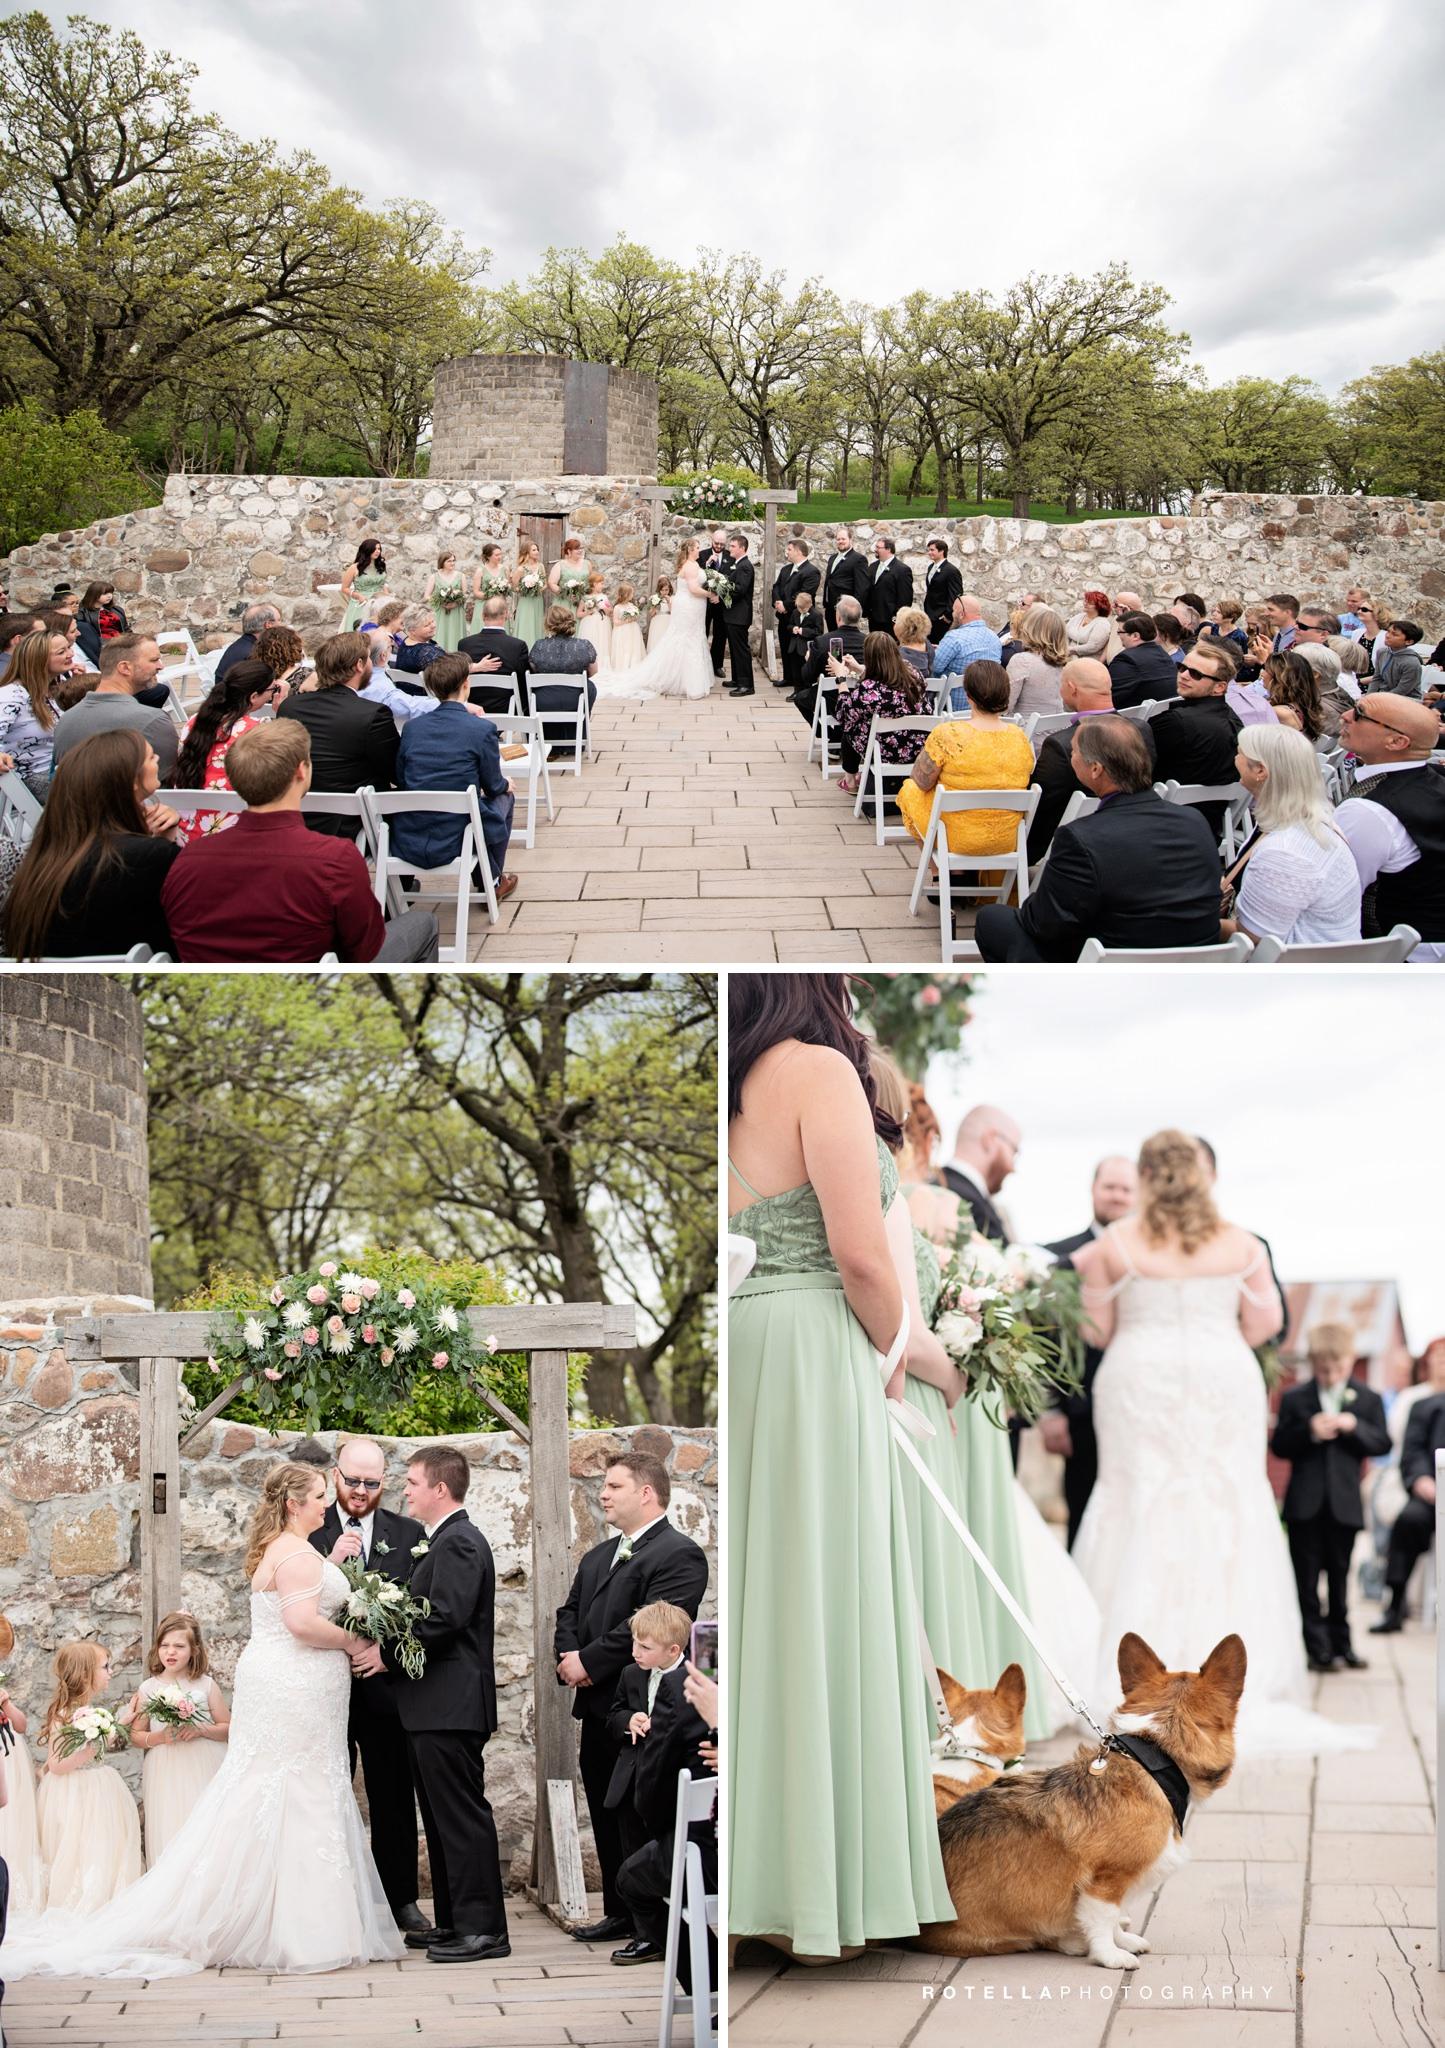 Cassie-Corbin-Wedding-05-25-2019-Rotella-Photography-PREV-97-742_BLOG.jpg